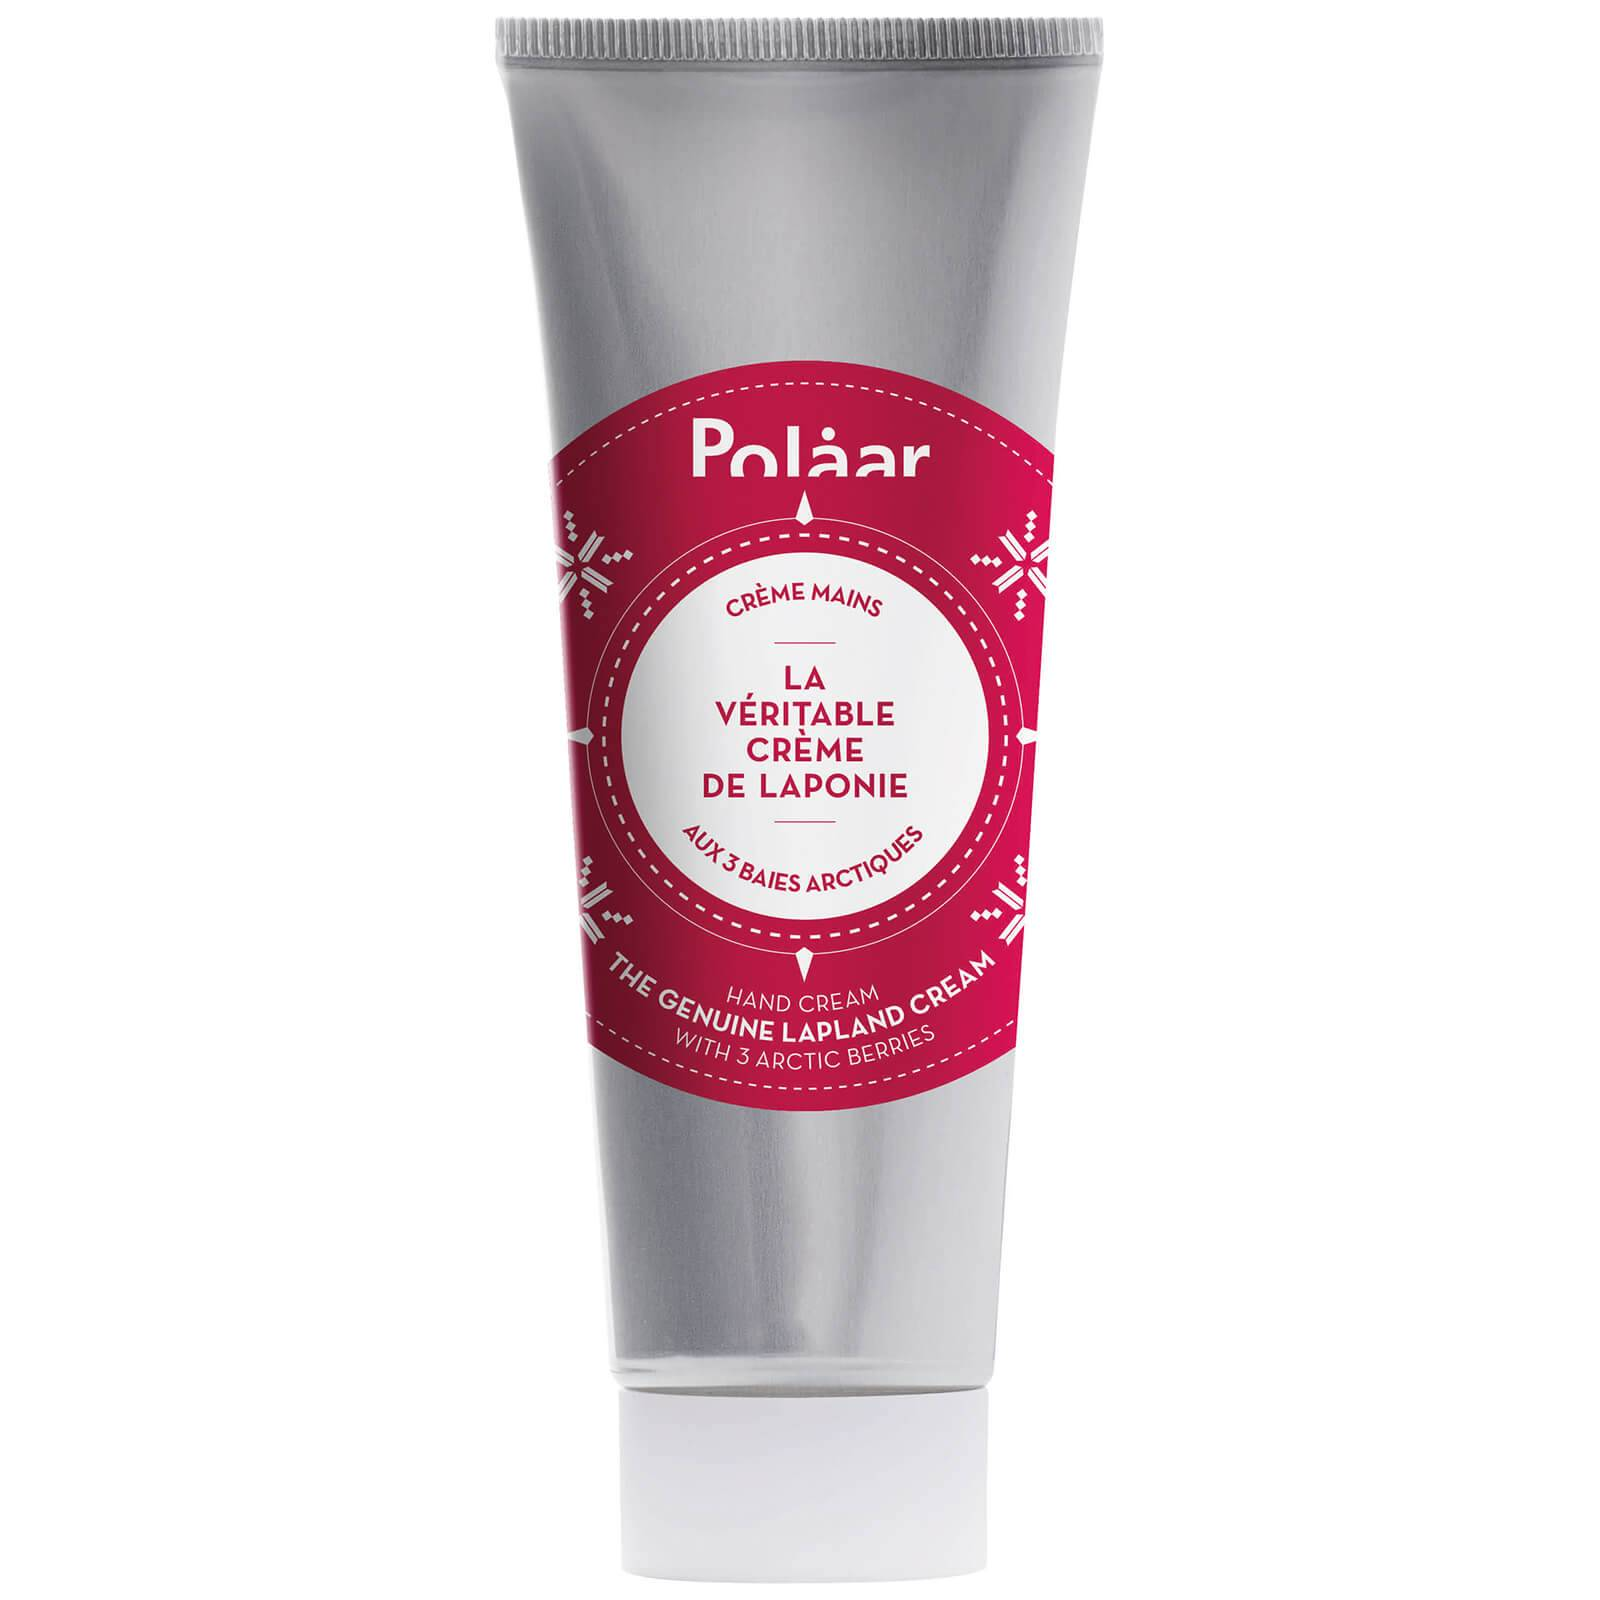 Polaar The Genuine Lapland Hand Cream 75ml